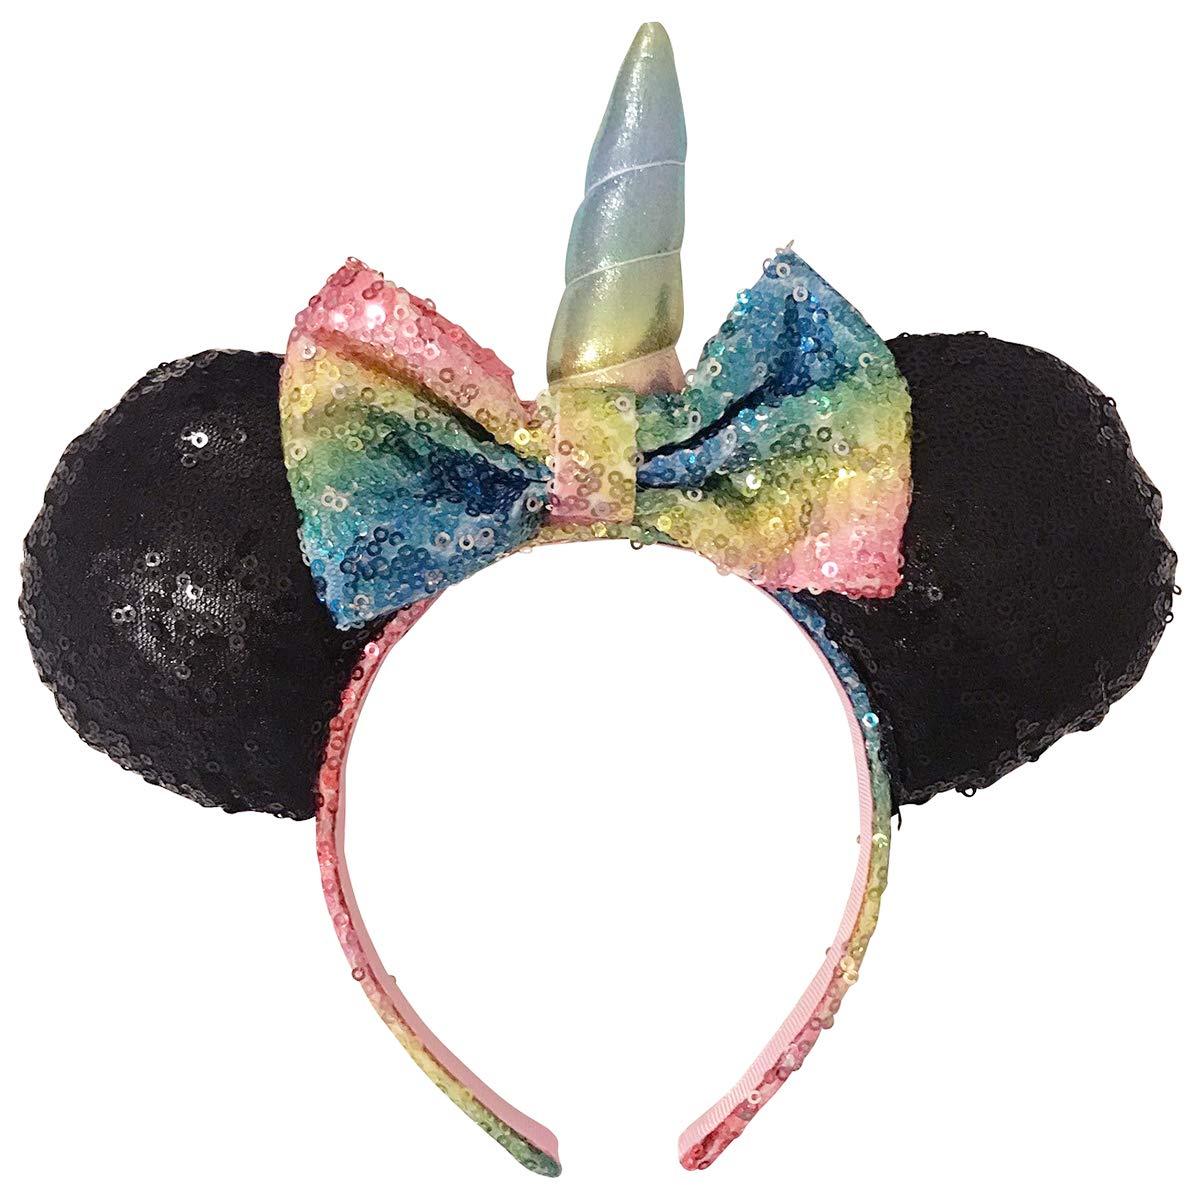 2ed395d7f6bd Minnie Mouse Girls Sequins Bow and Ear Headband - Rainbow Sequin Bow with  Unicorn Horn and